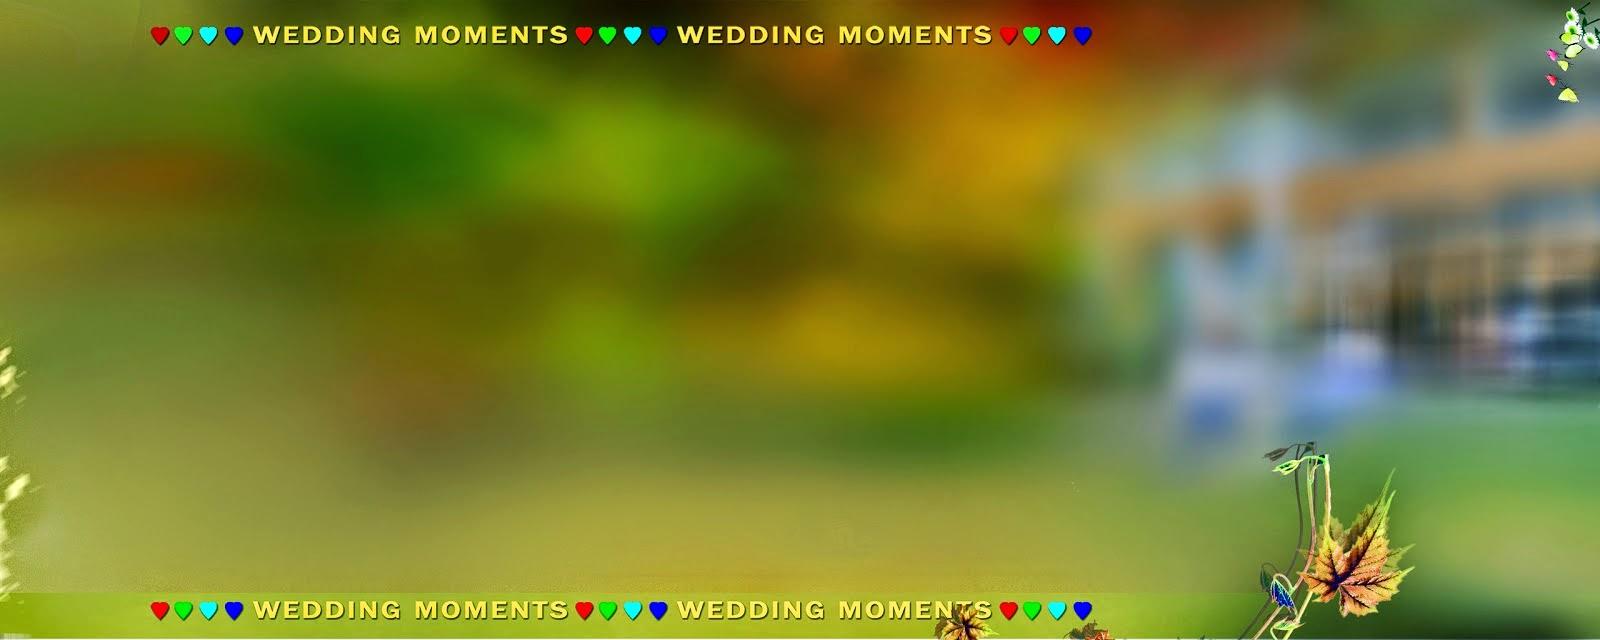 Karizma Album 12x30 Psd Wedding Background Free Download - StudioPk